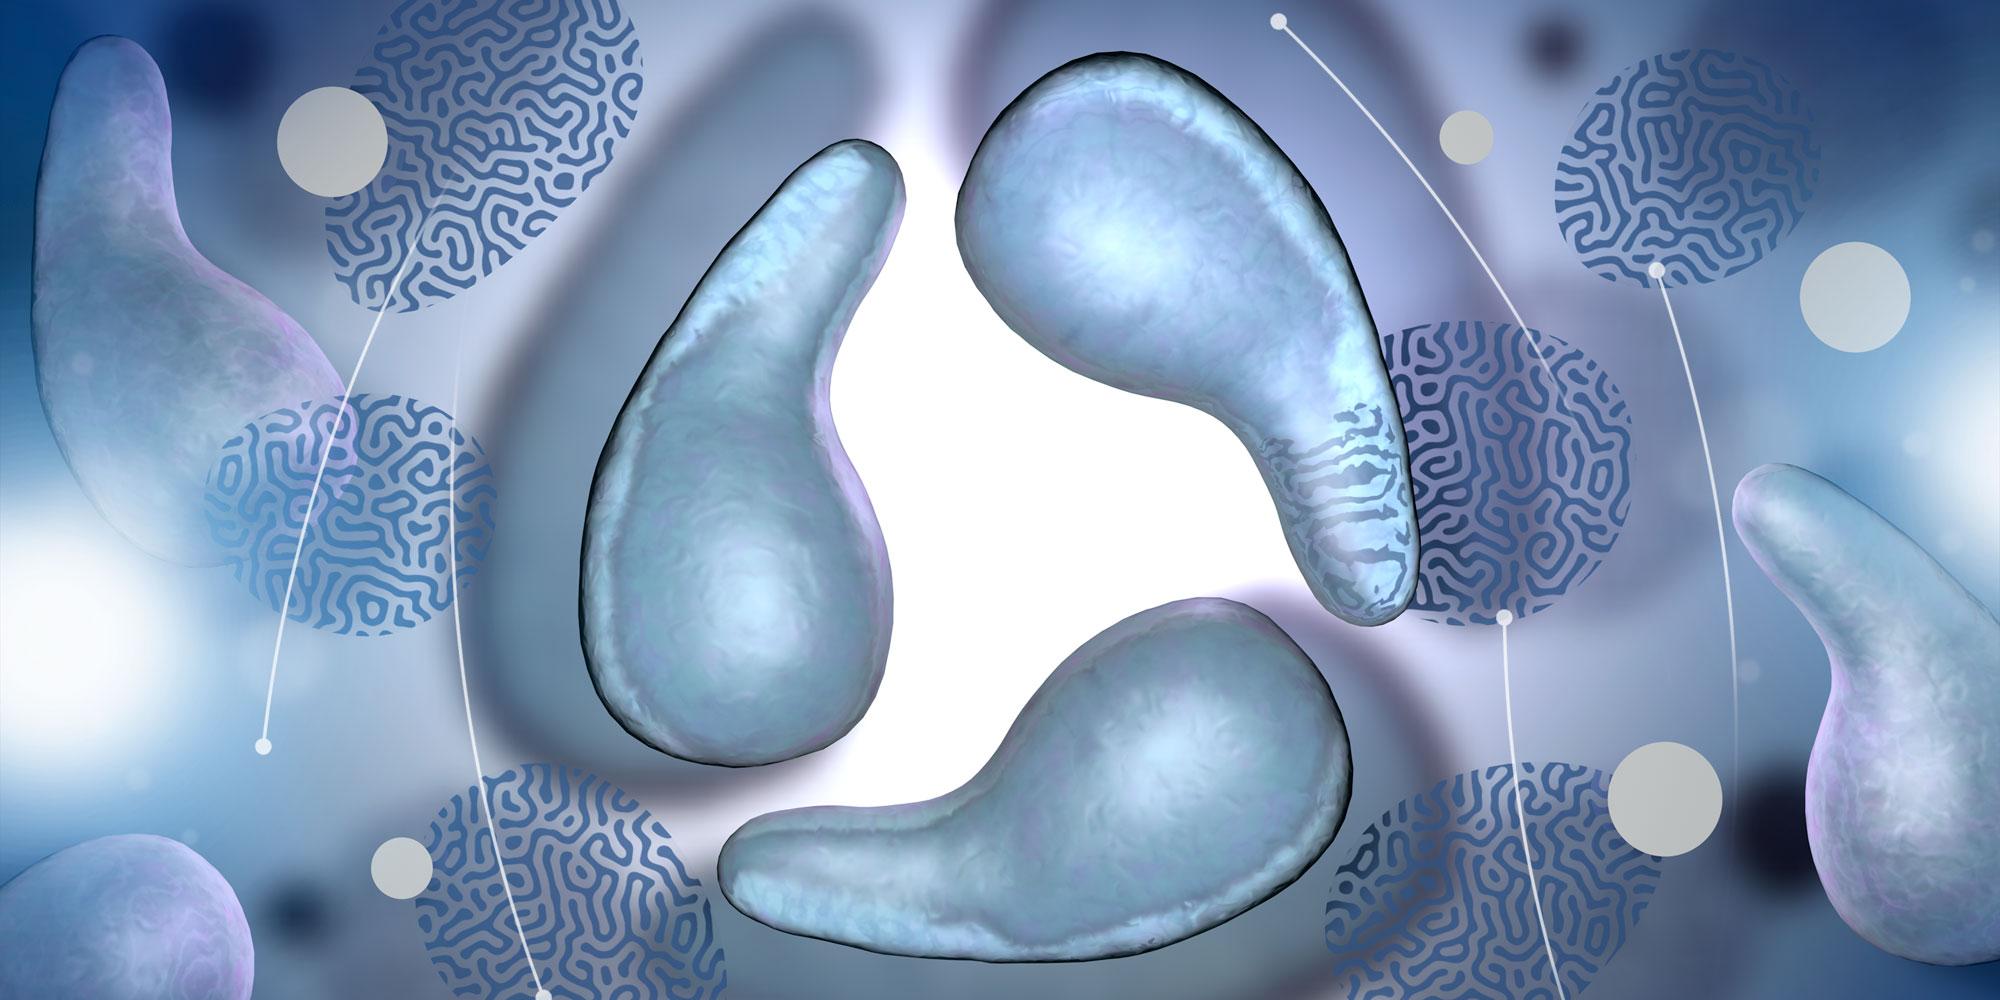 Mycoplasma genitalium: considerations for testing and